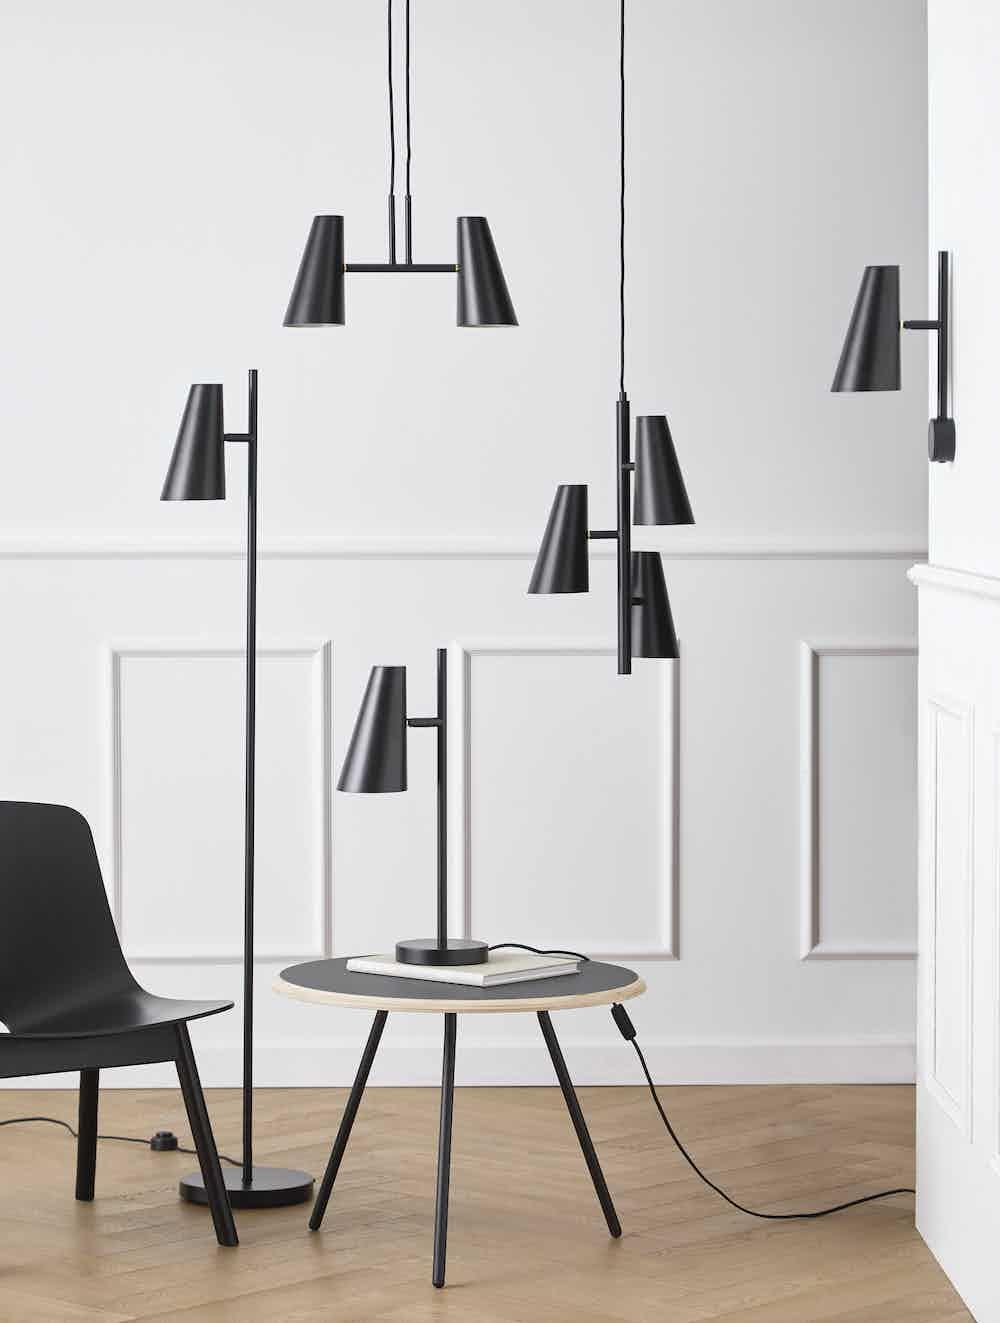 Woud furniture cono pendant 2 shades insitu haute living